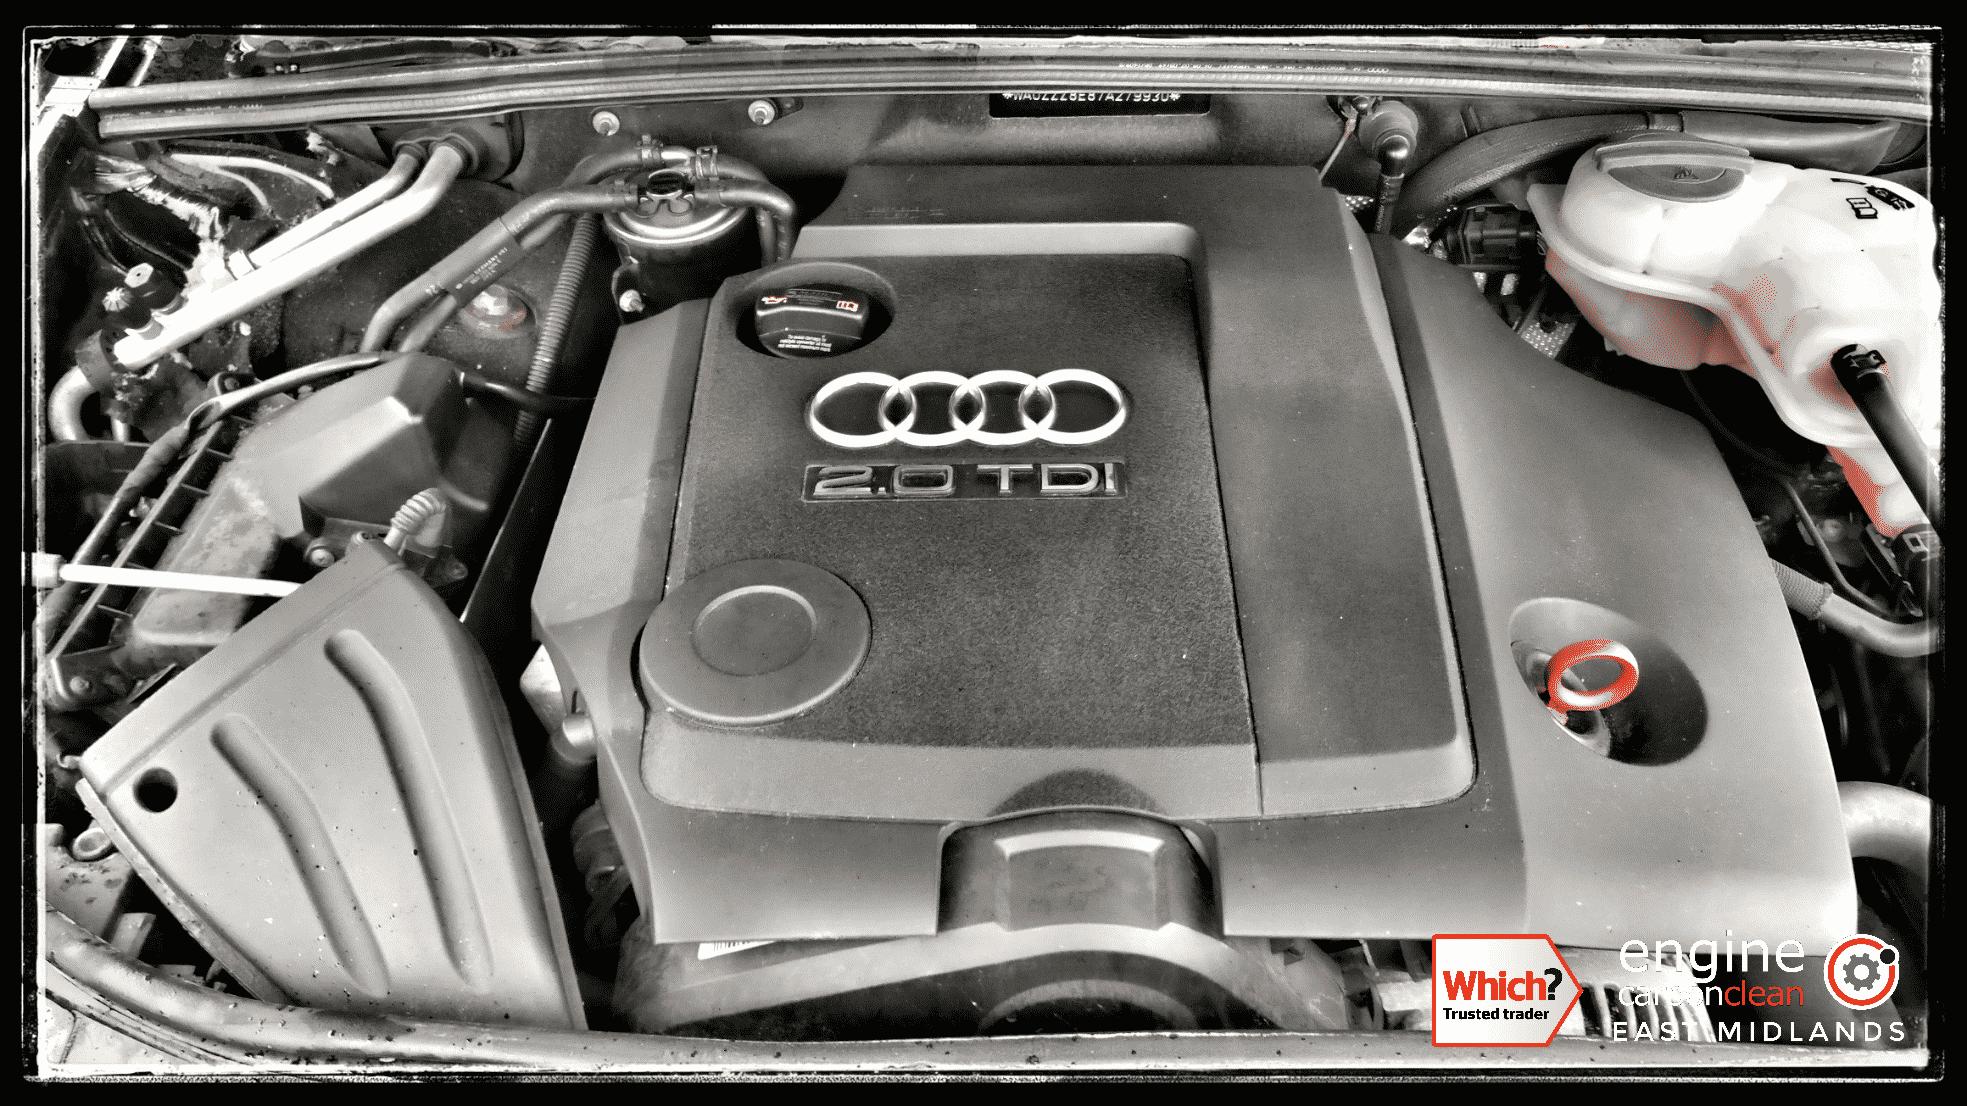 Audi A4 2.0 TDI (2007 - 90,277)